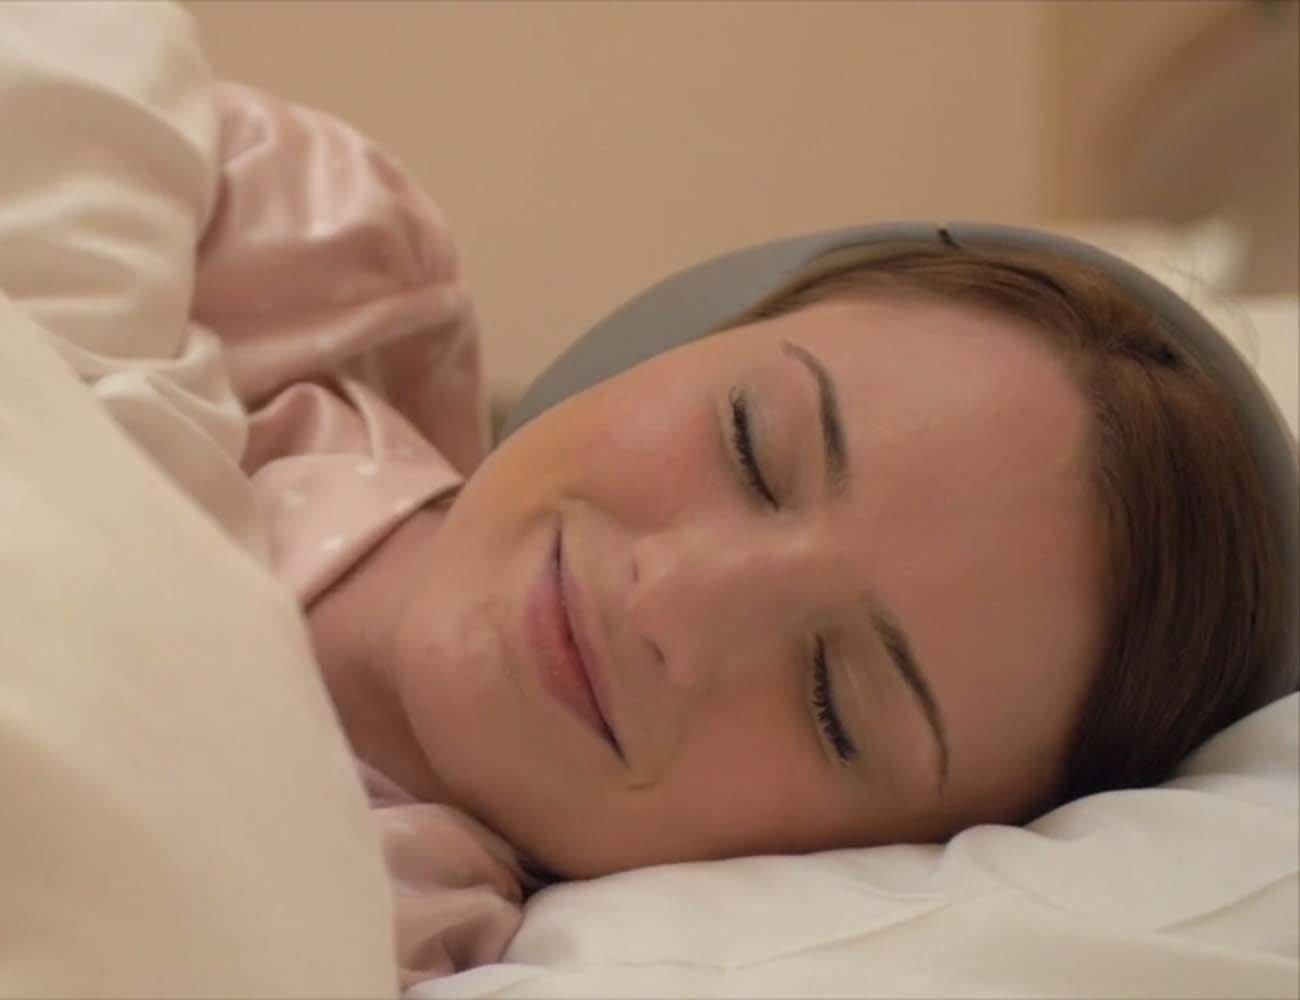 10 Sleep tech gadgets to help you get some shuteye - kokoon 03